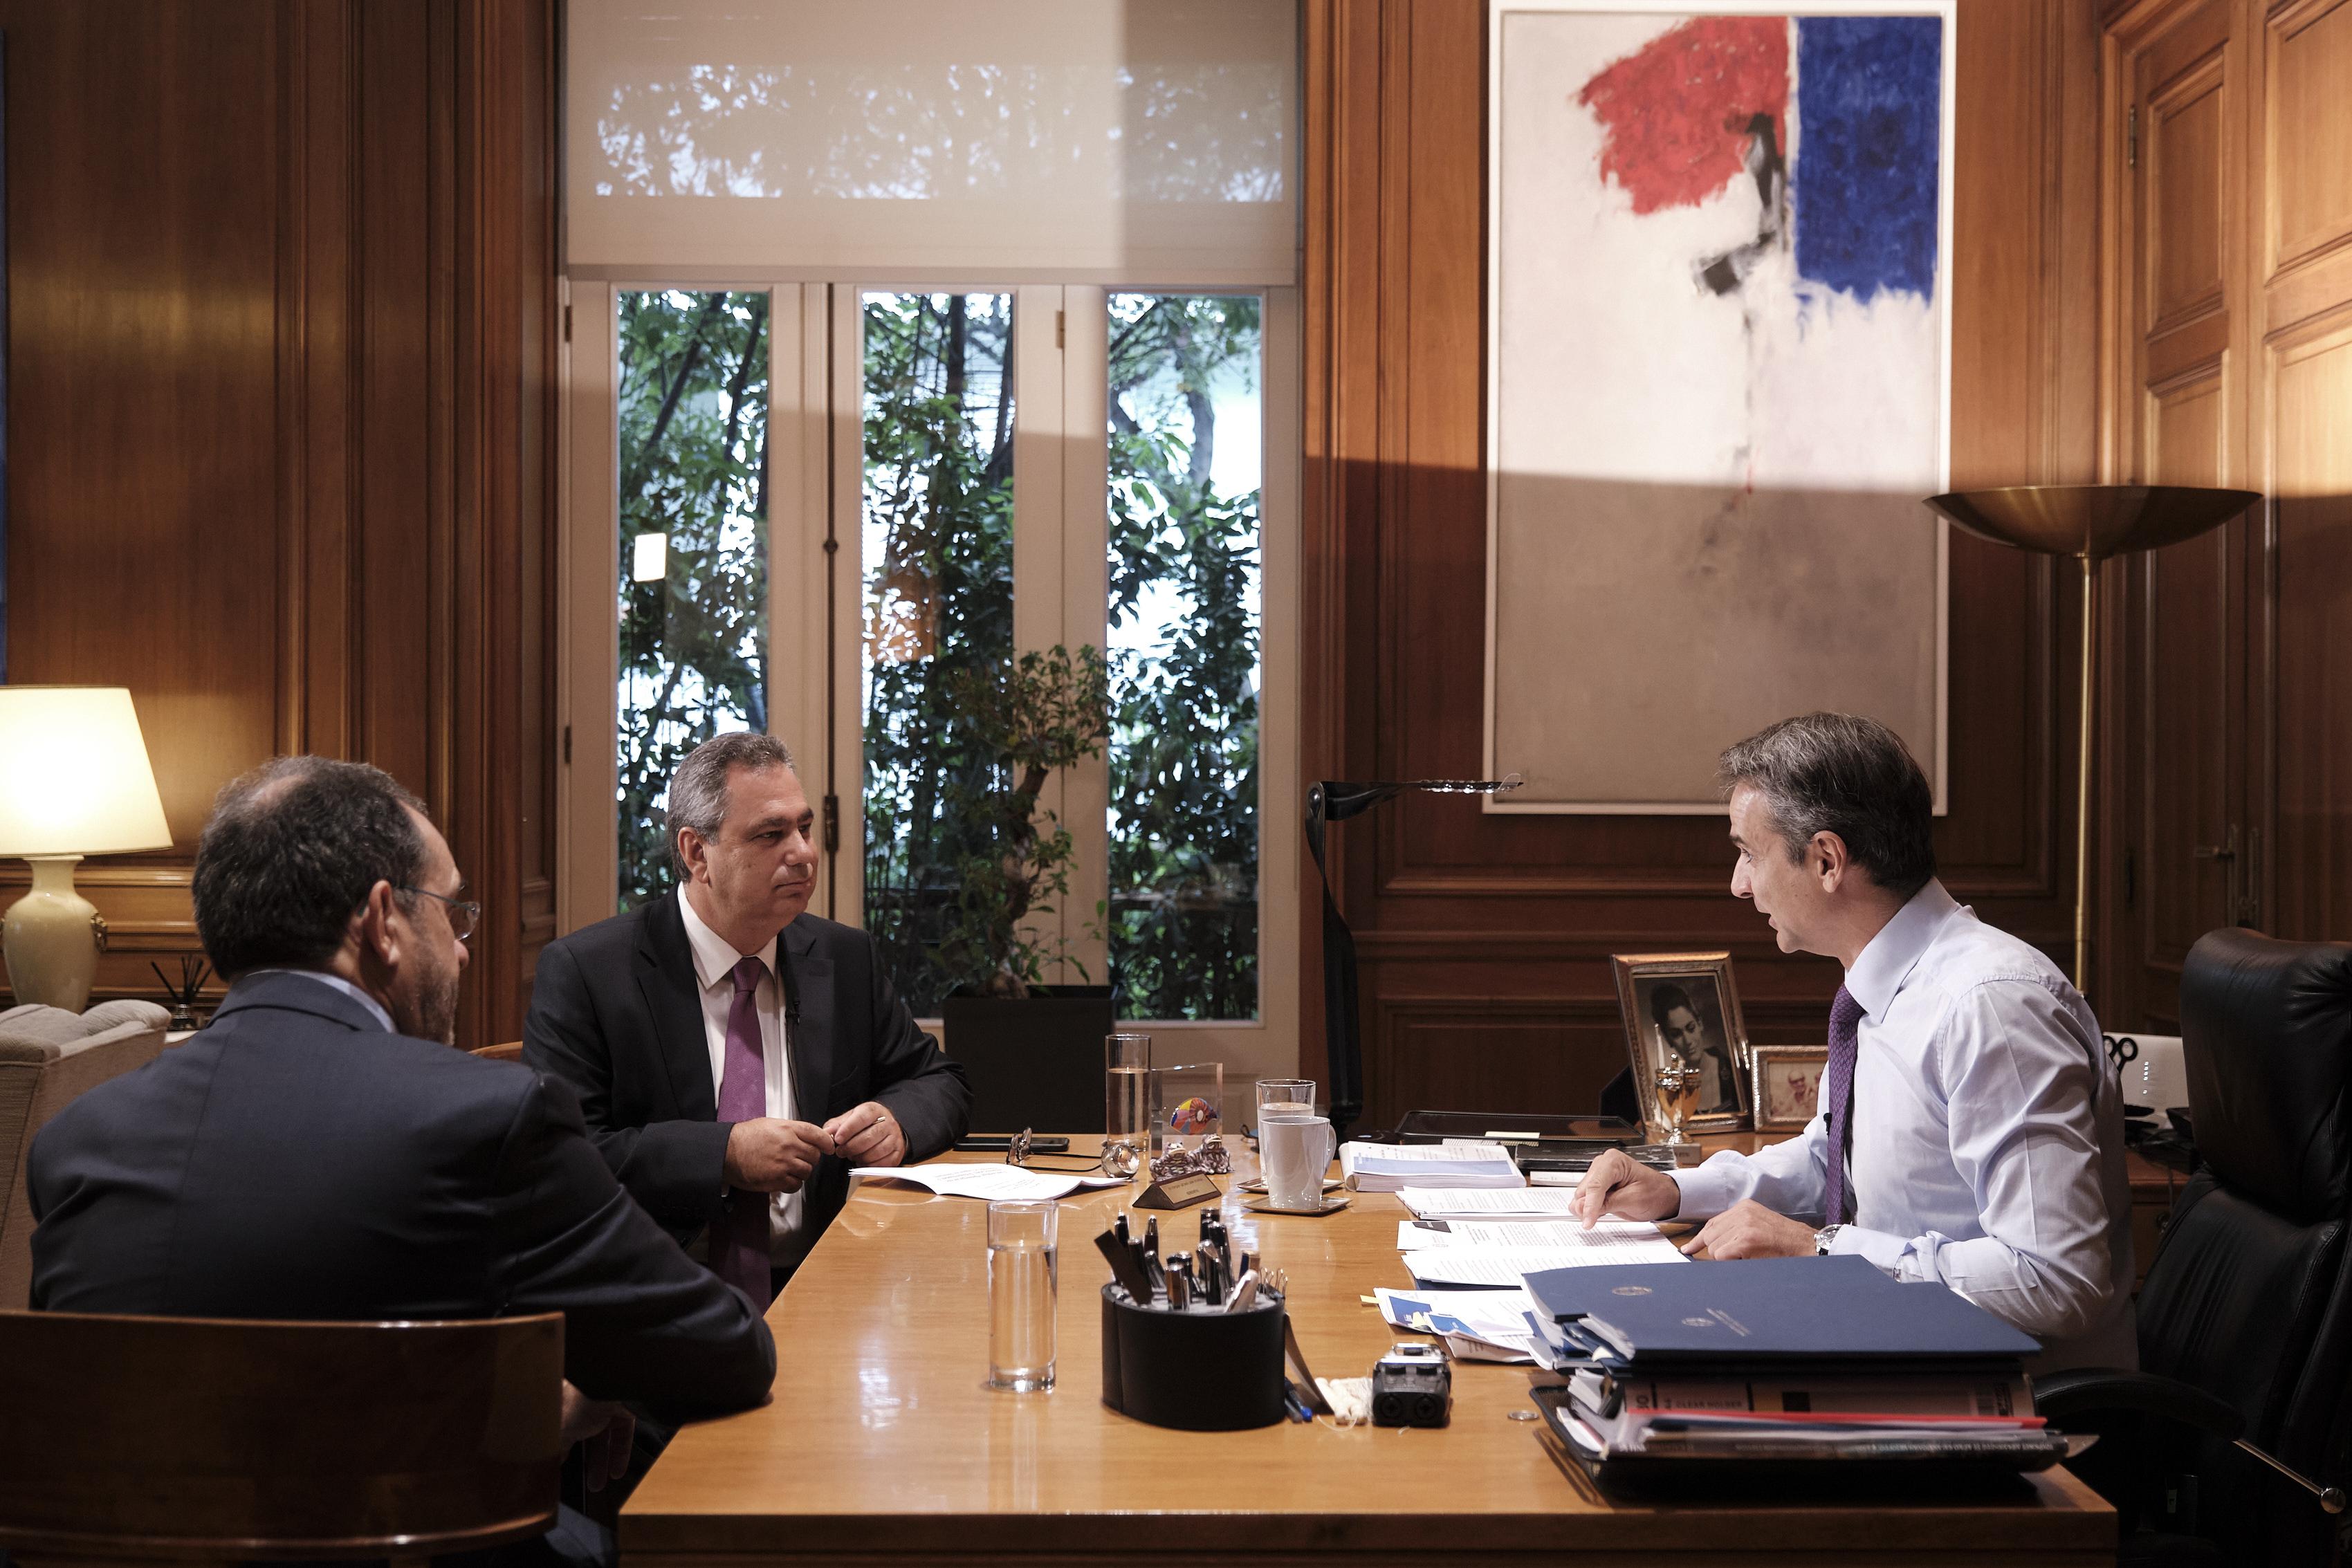 K.Μητσοτάκης: Δεν μεσολάβησε η Μέρκελ για την επικοινωνία μου με Ερντογάν...